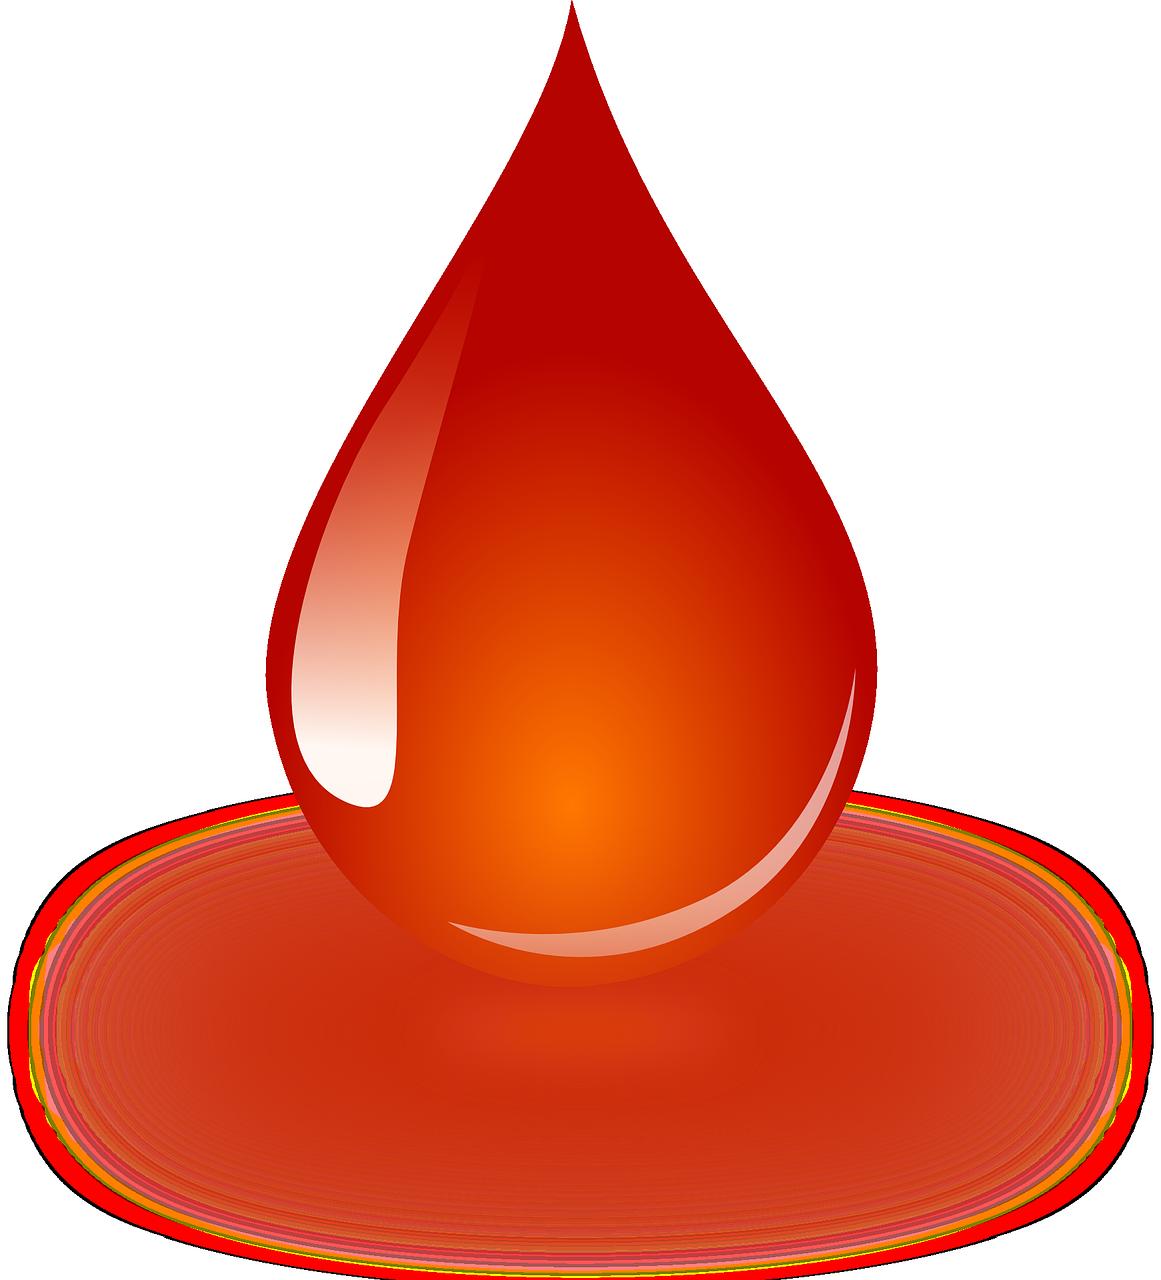 Blood donation event kicks off march 17 u of g news buycottarizona